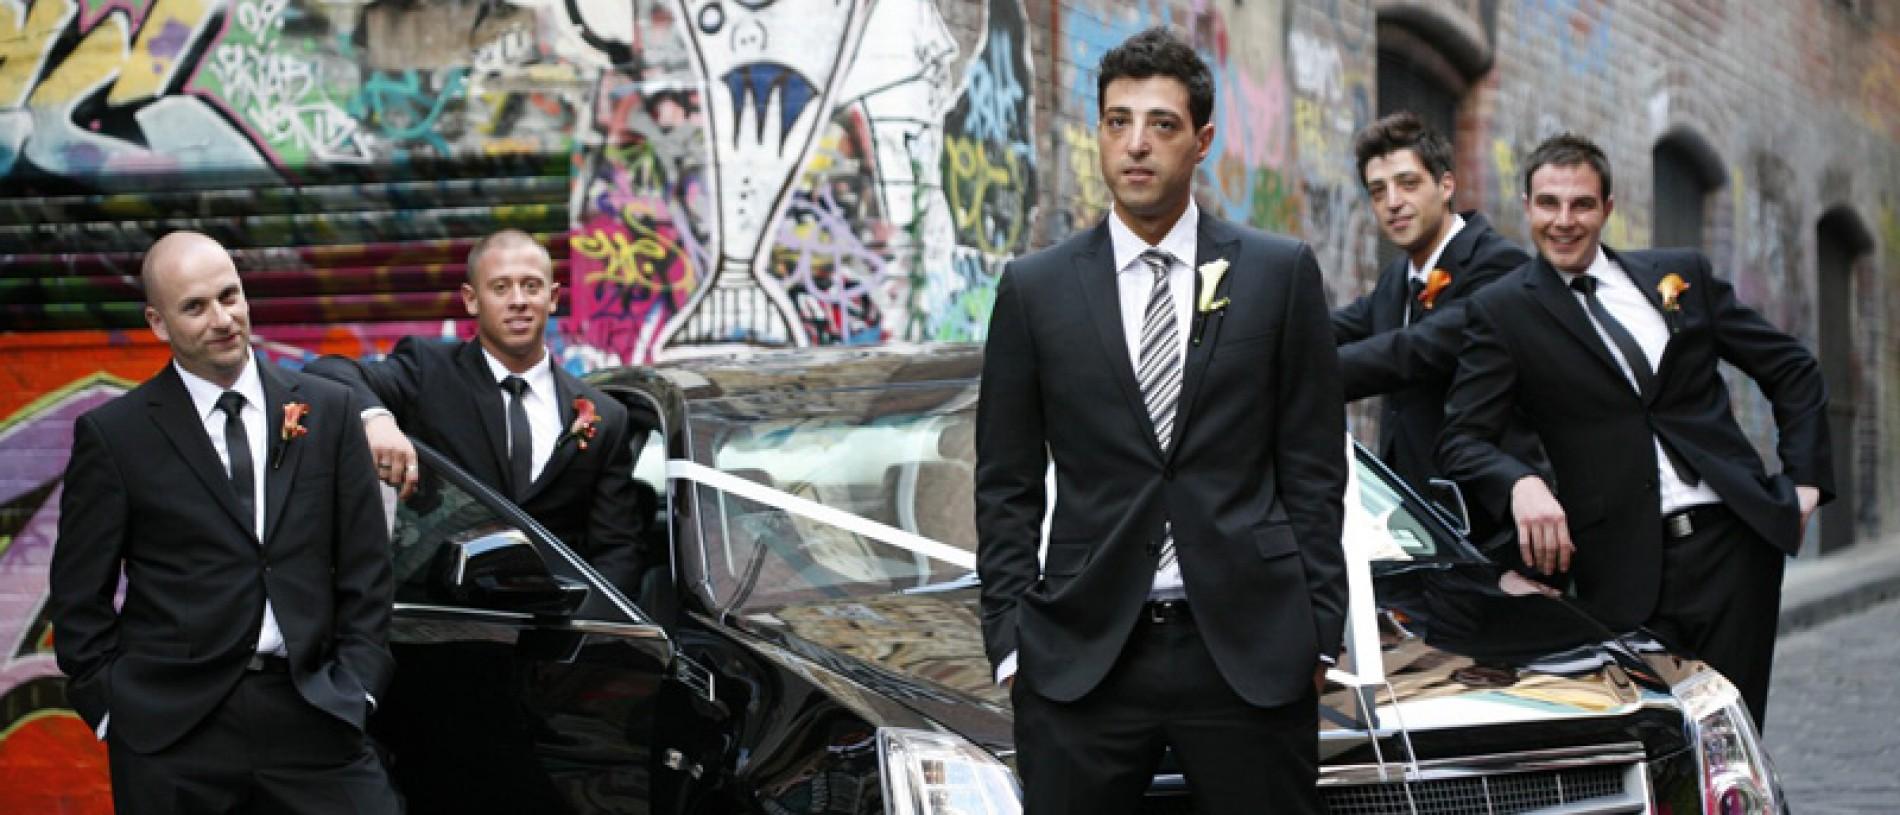 Black Chrysler Limo Hire Melbourne